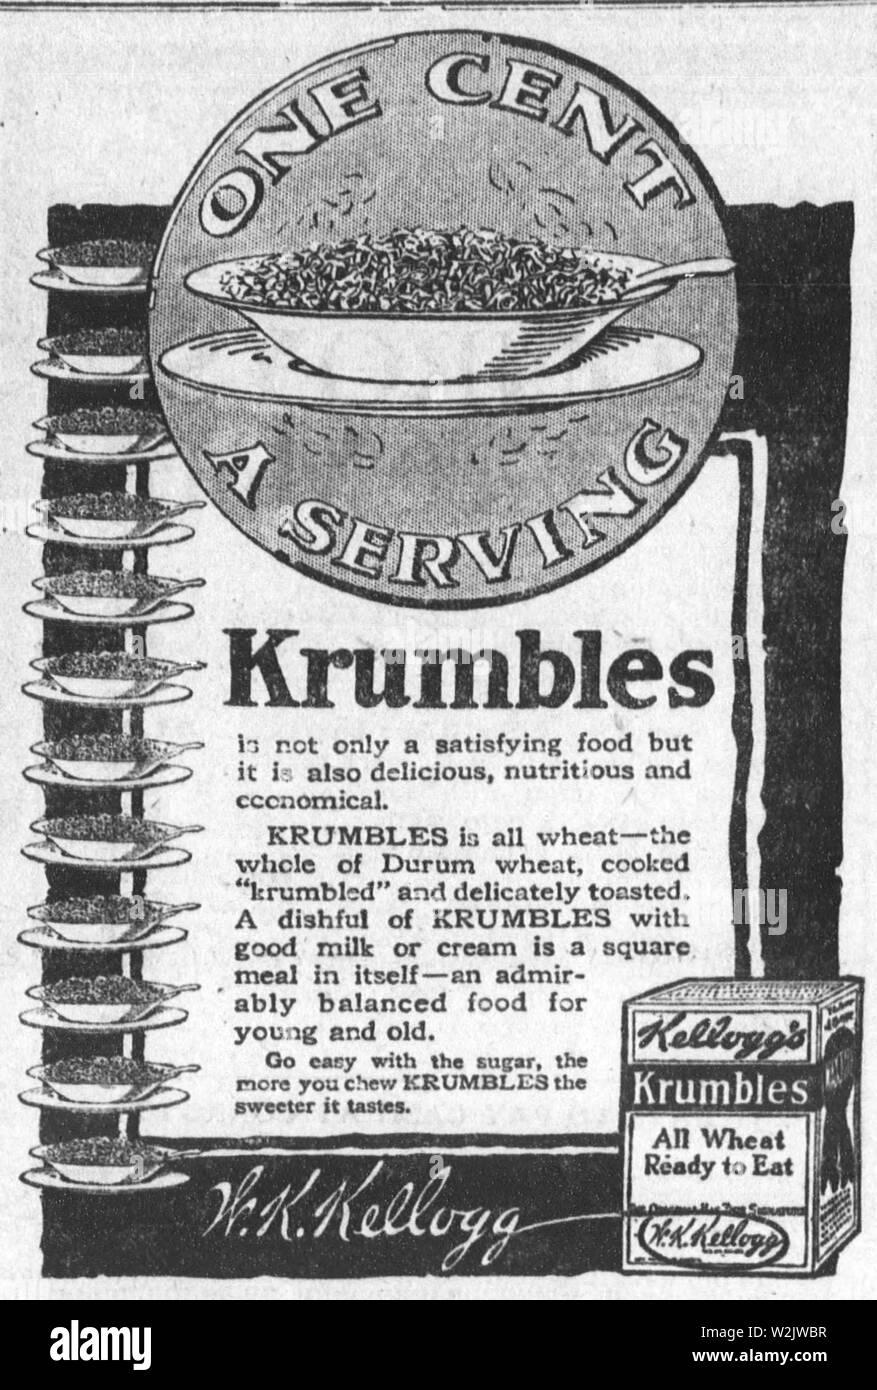 1917 advertisement for Krumbles, Kellogg's breakfast cereal named 'Krumbles' - Stock Image